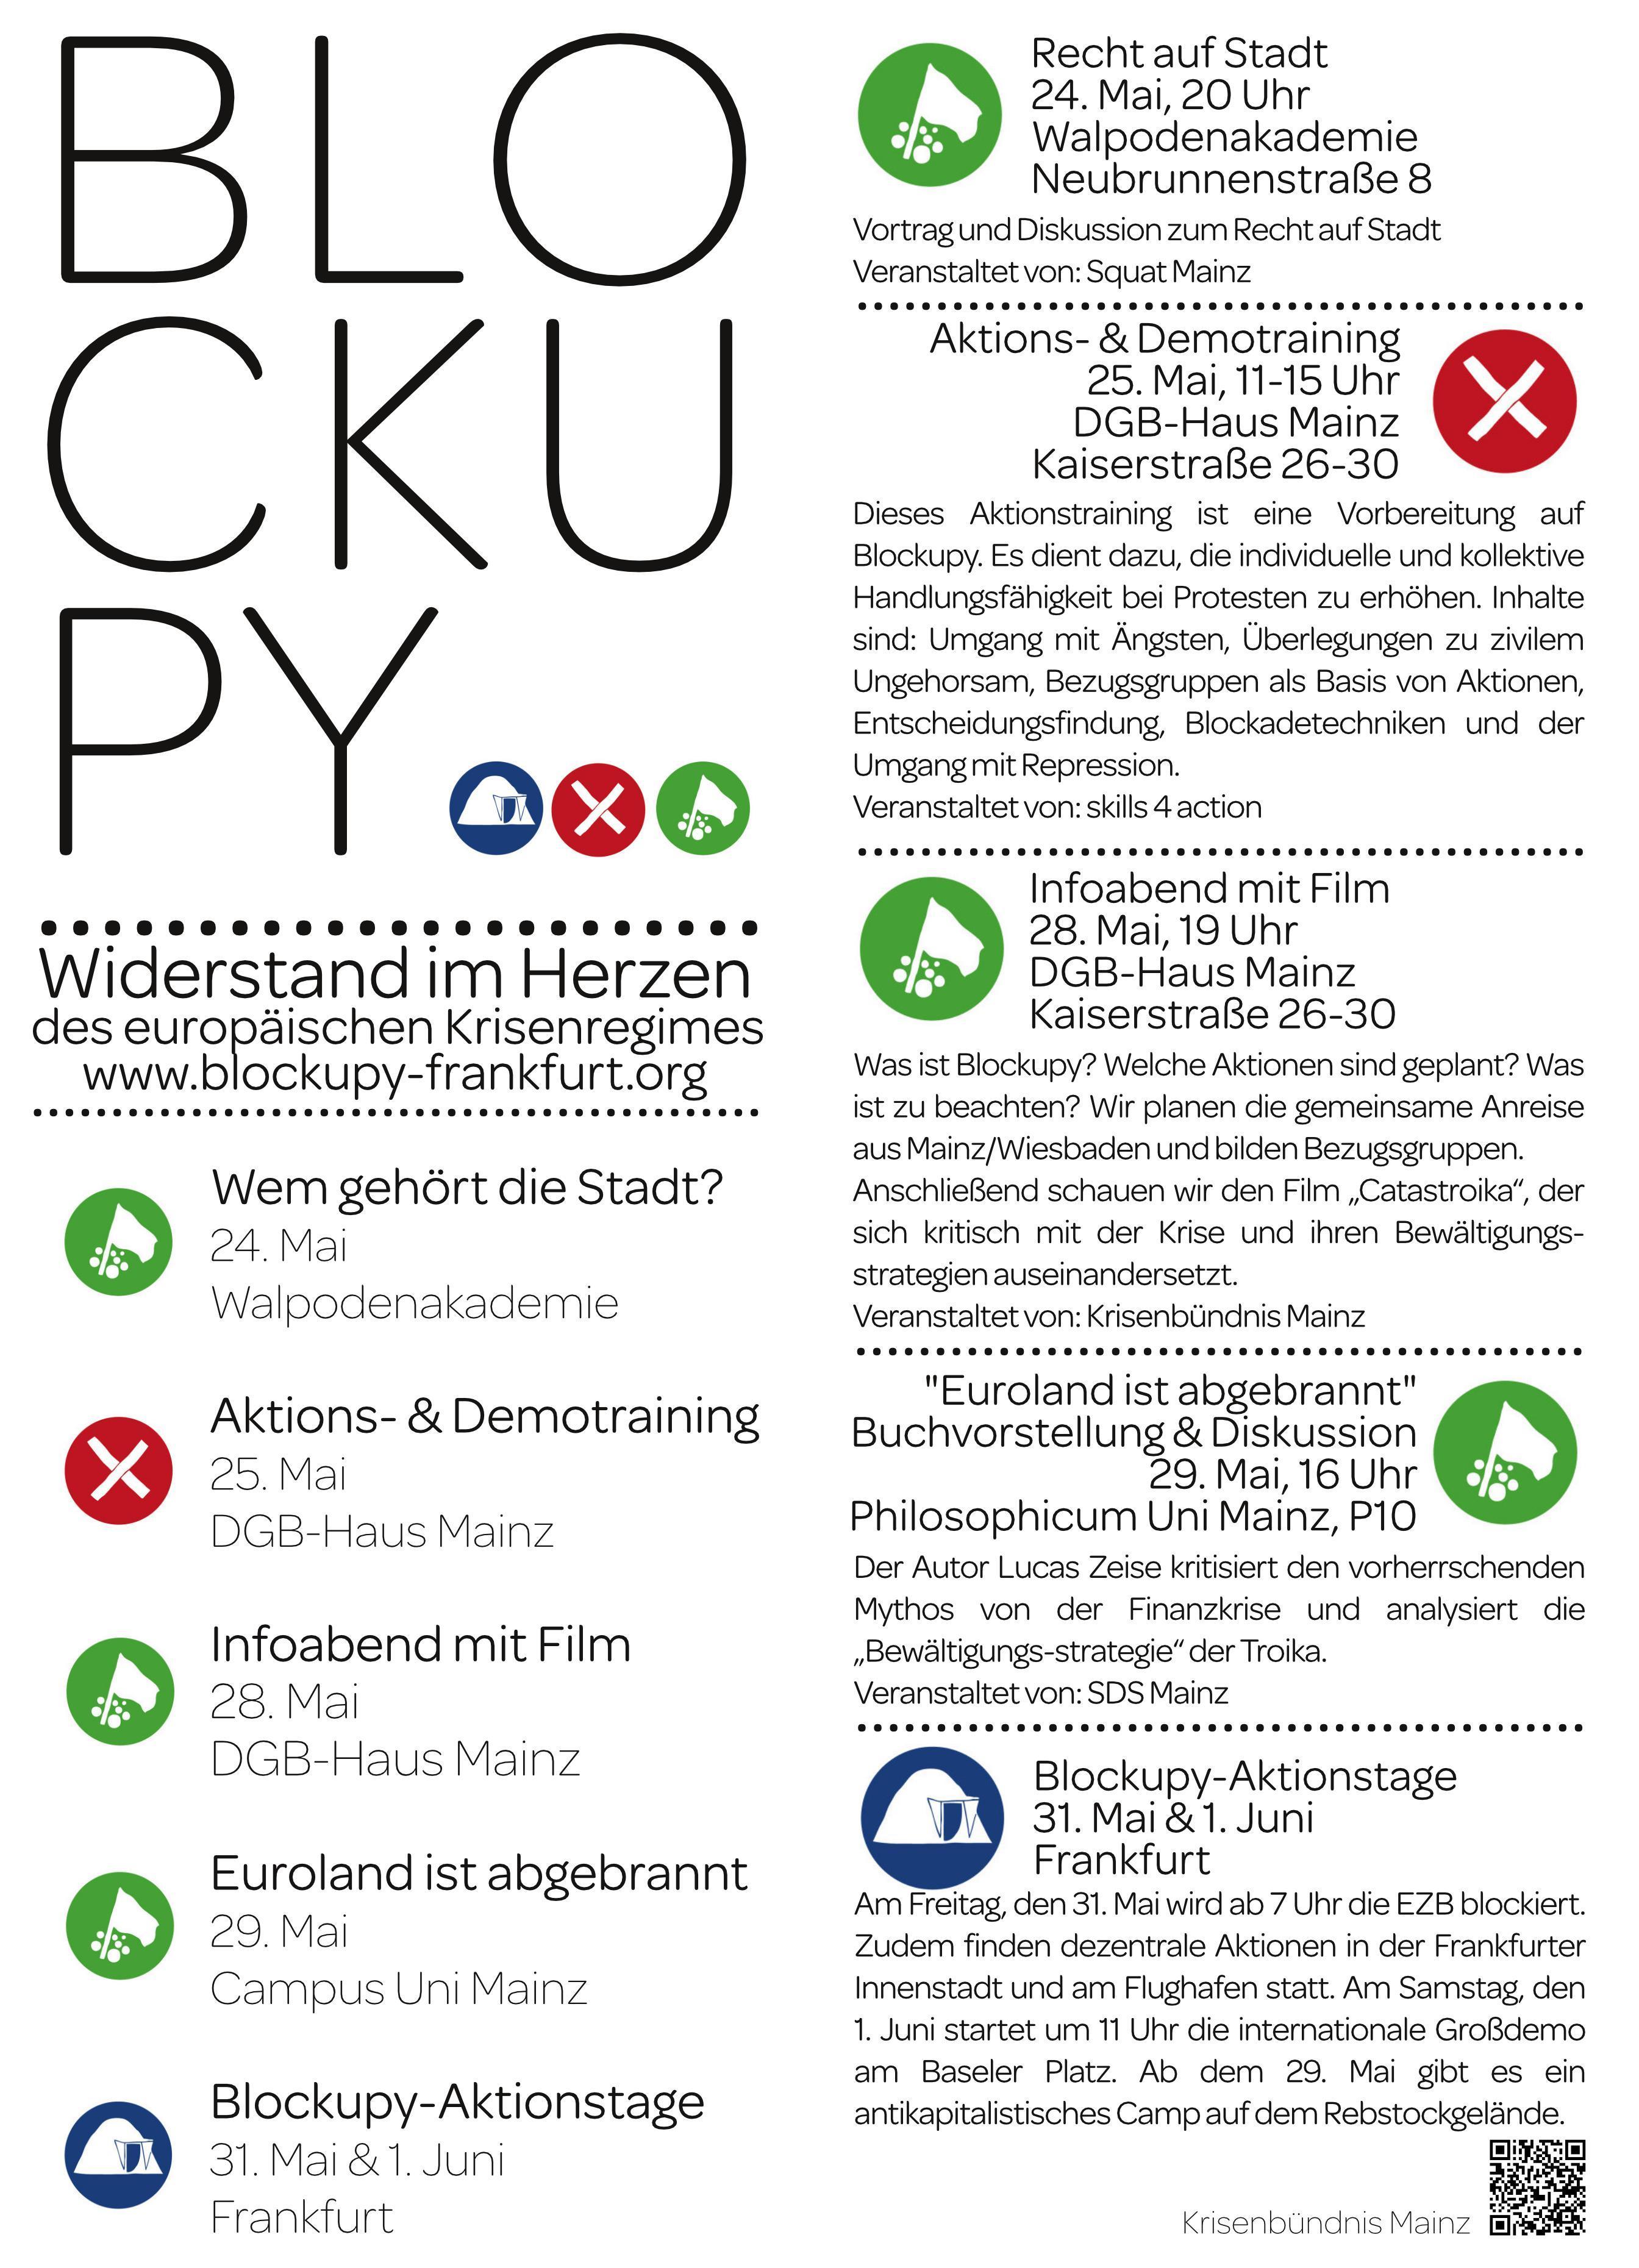 blockupy2013